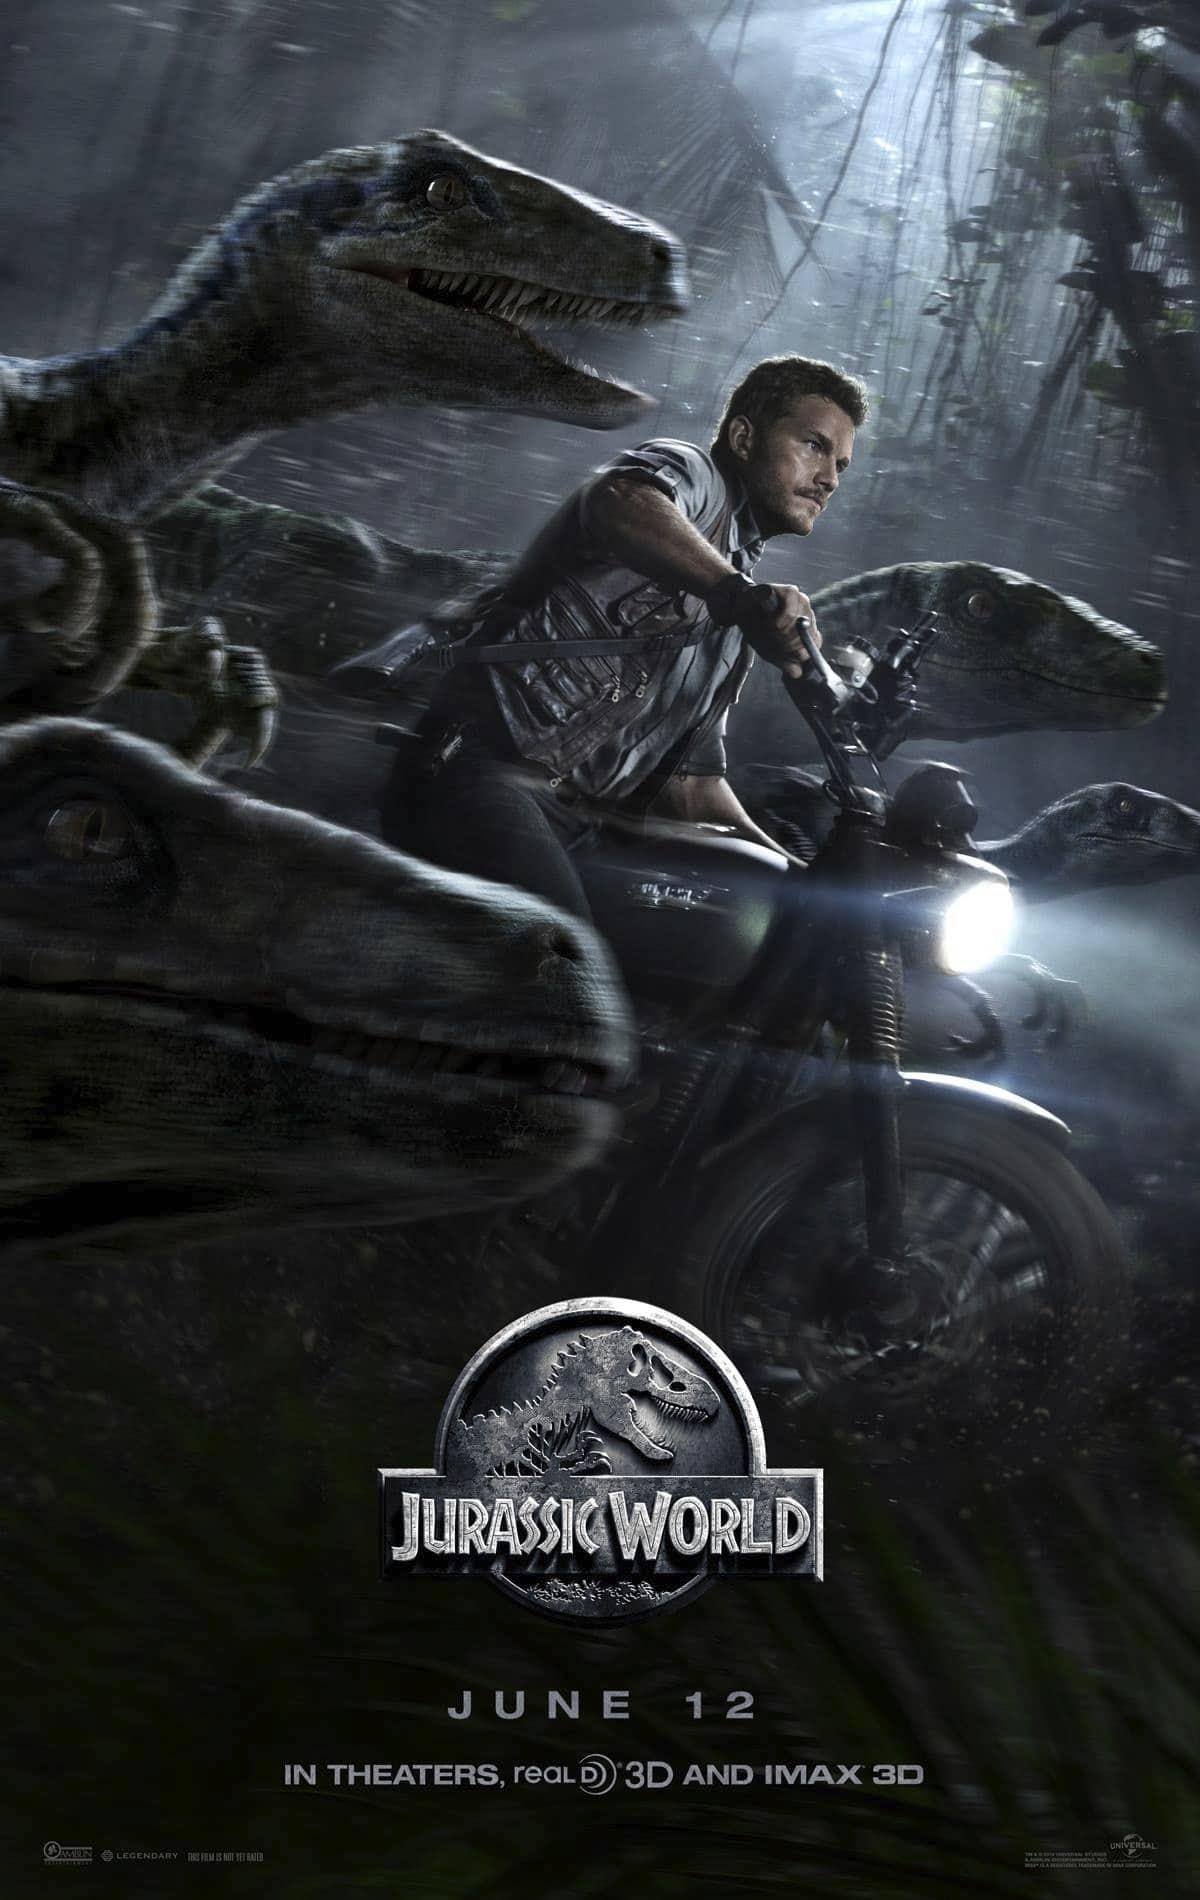 Jurassic-World-Poster-hd-printable-chris-pratt-owen-grady-bike-scene